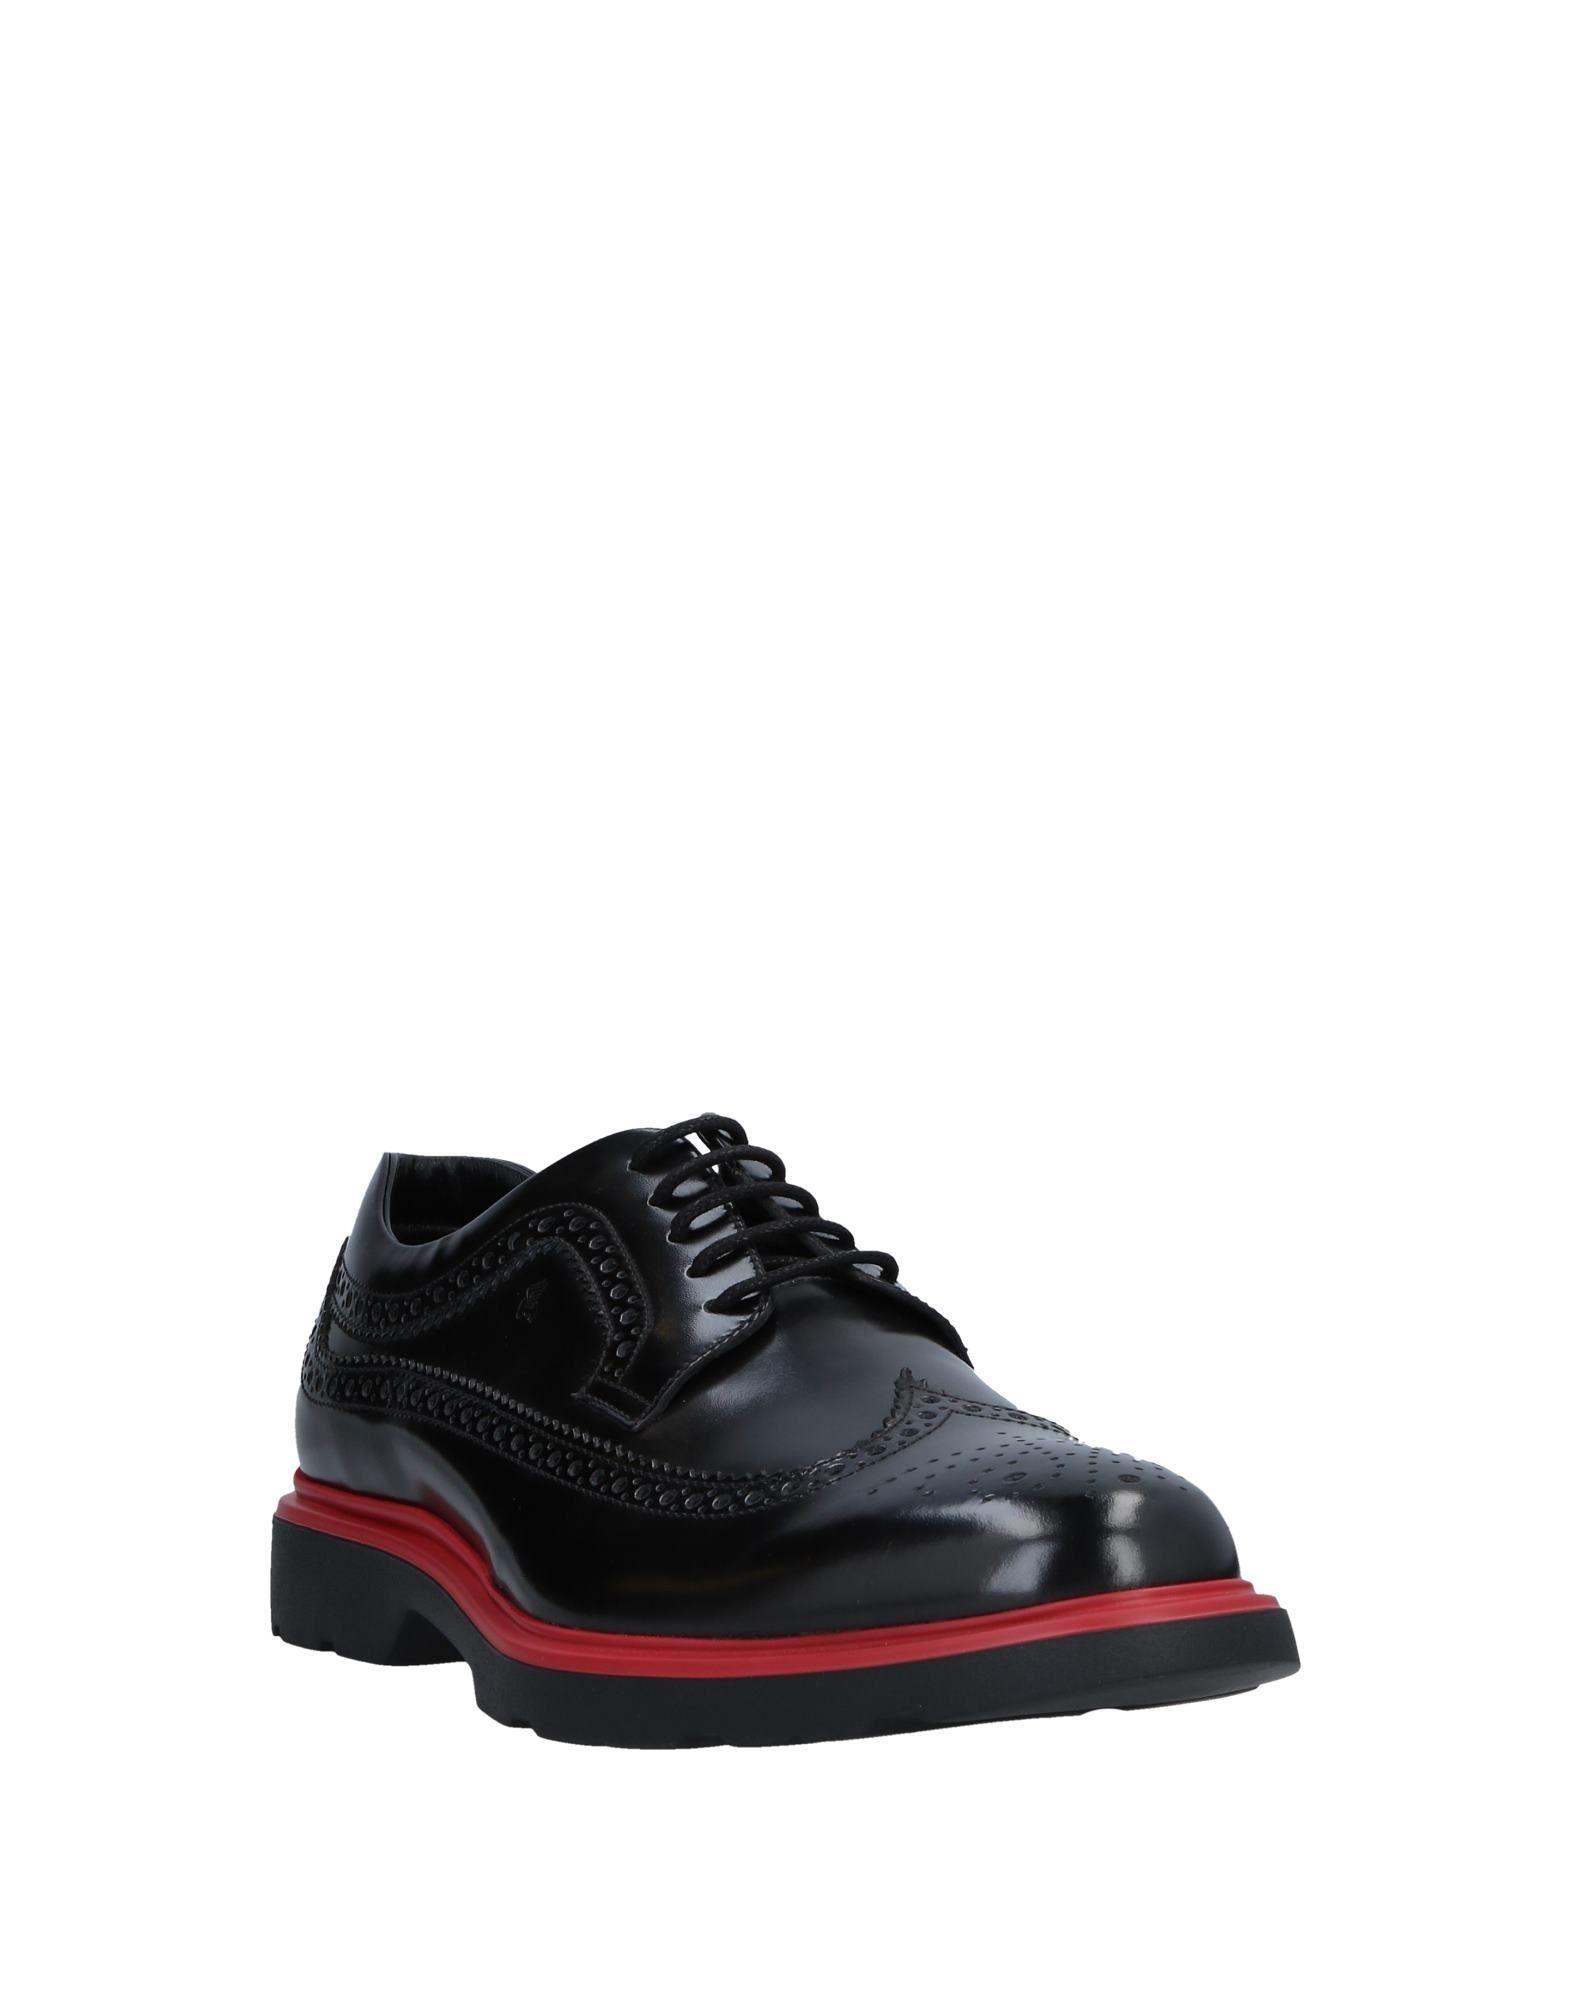 Hogan Schnürschuhe Herren  11539456NH Gute Qualität beliebte Schuhe